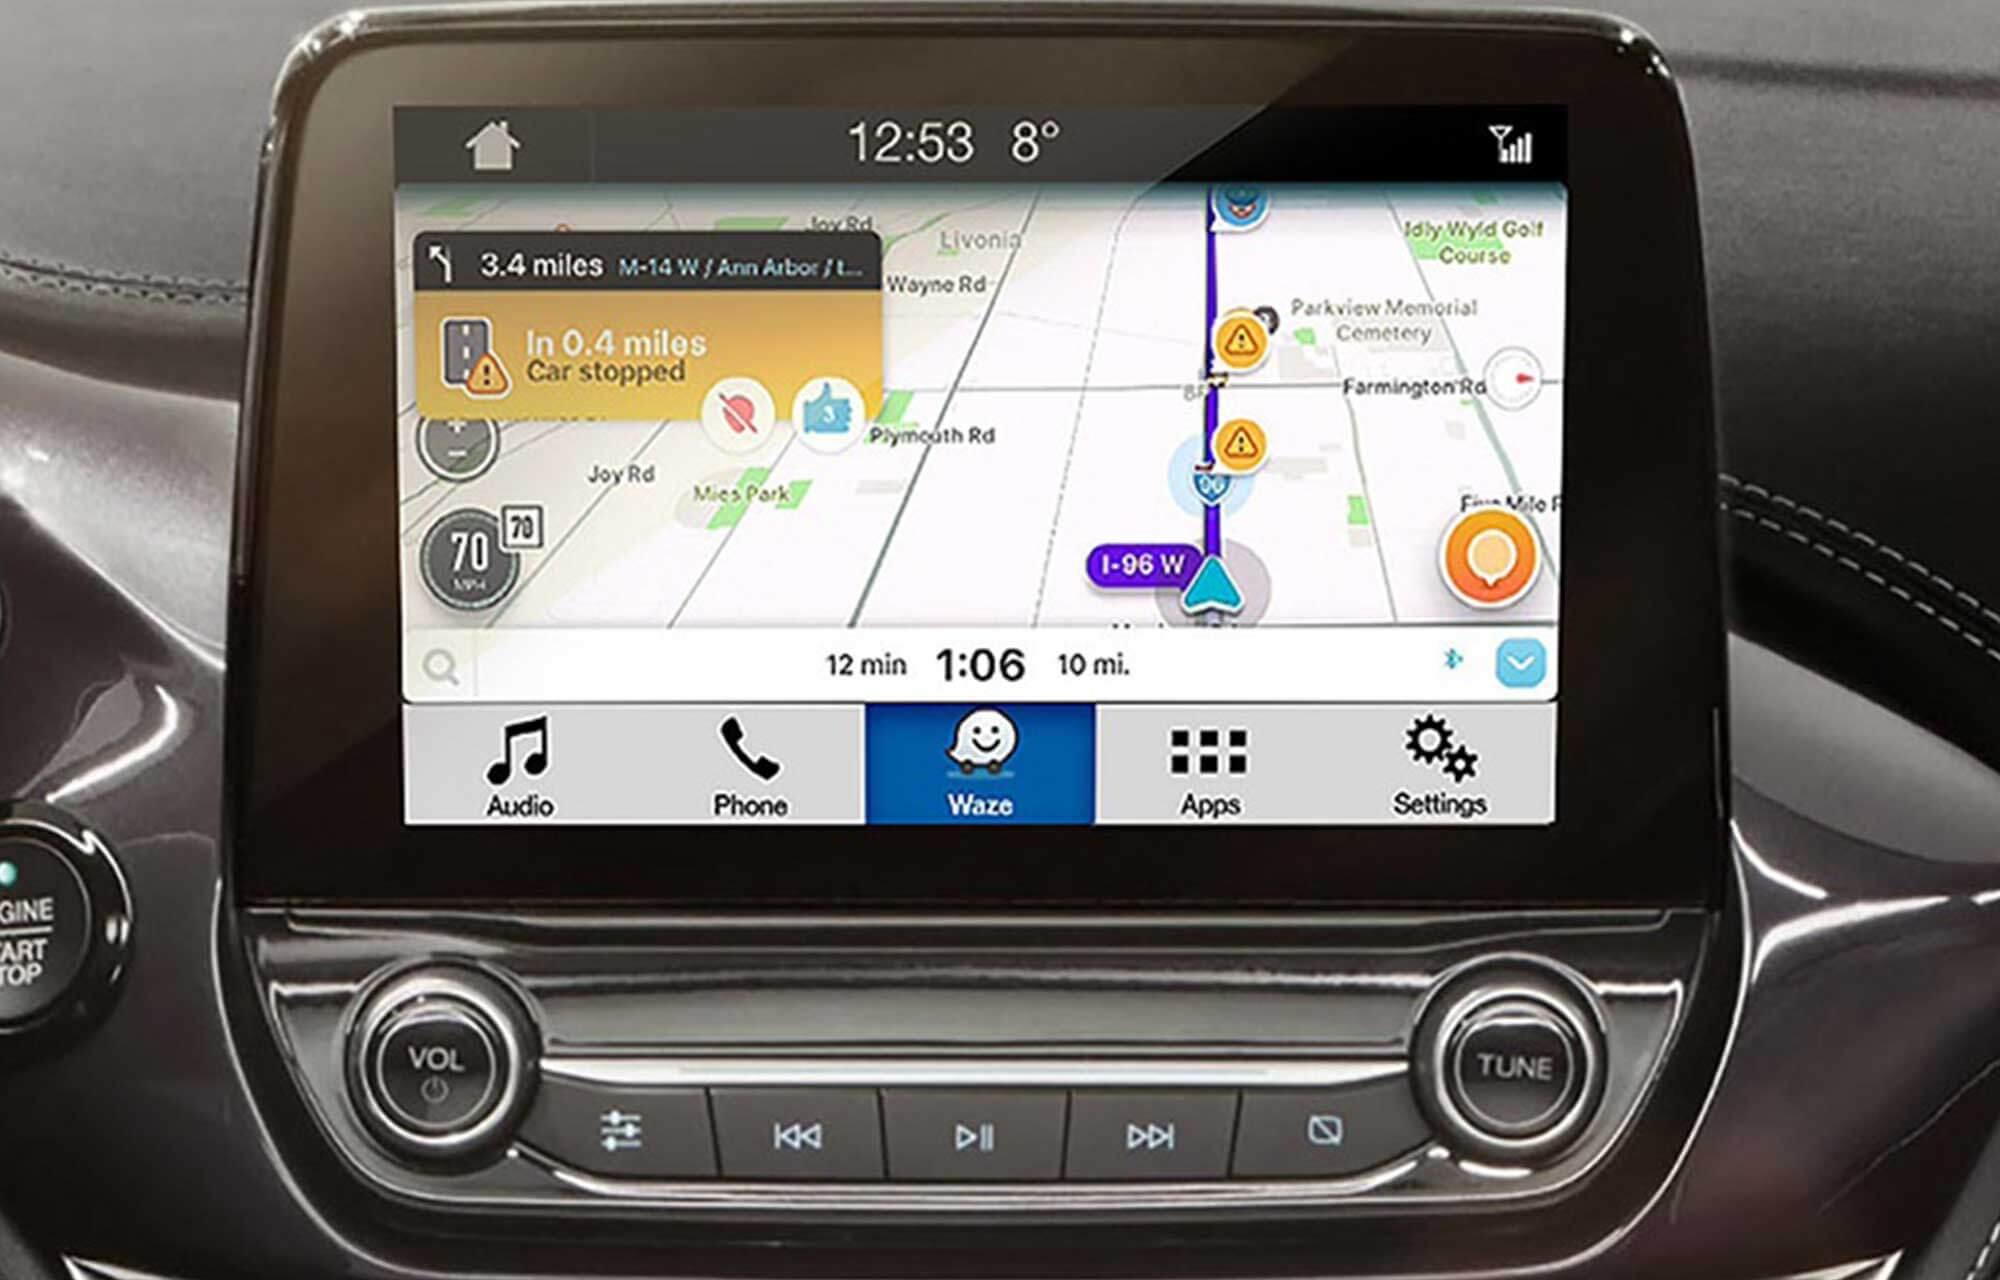 Waze Applink SYNC 3 routebeschrijving